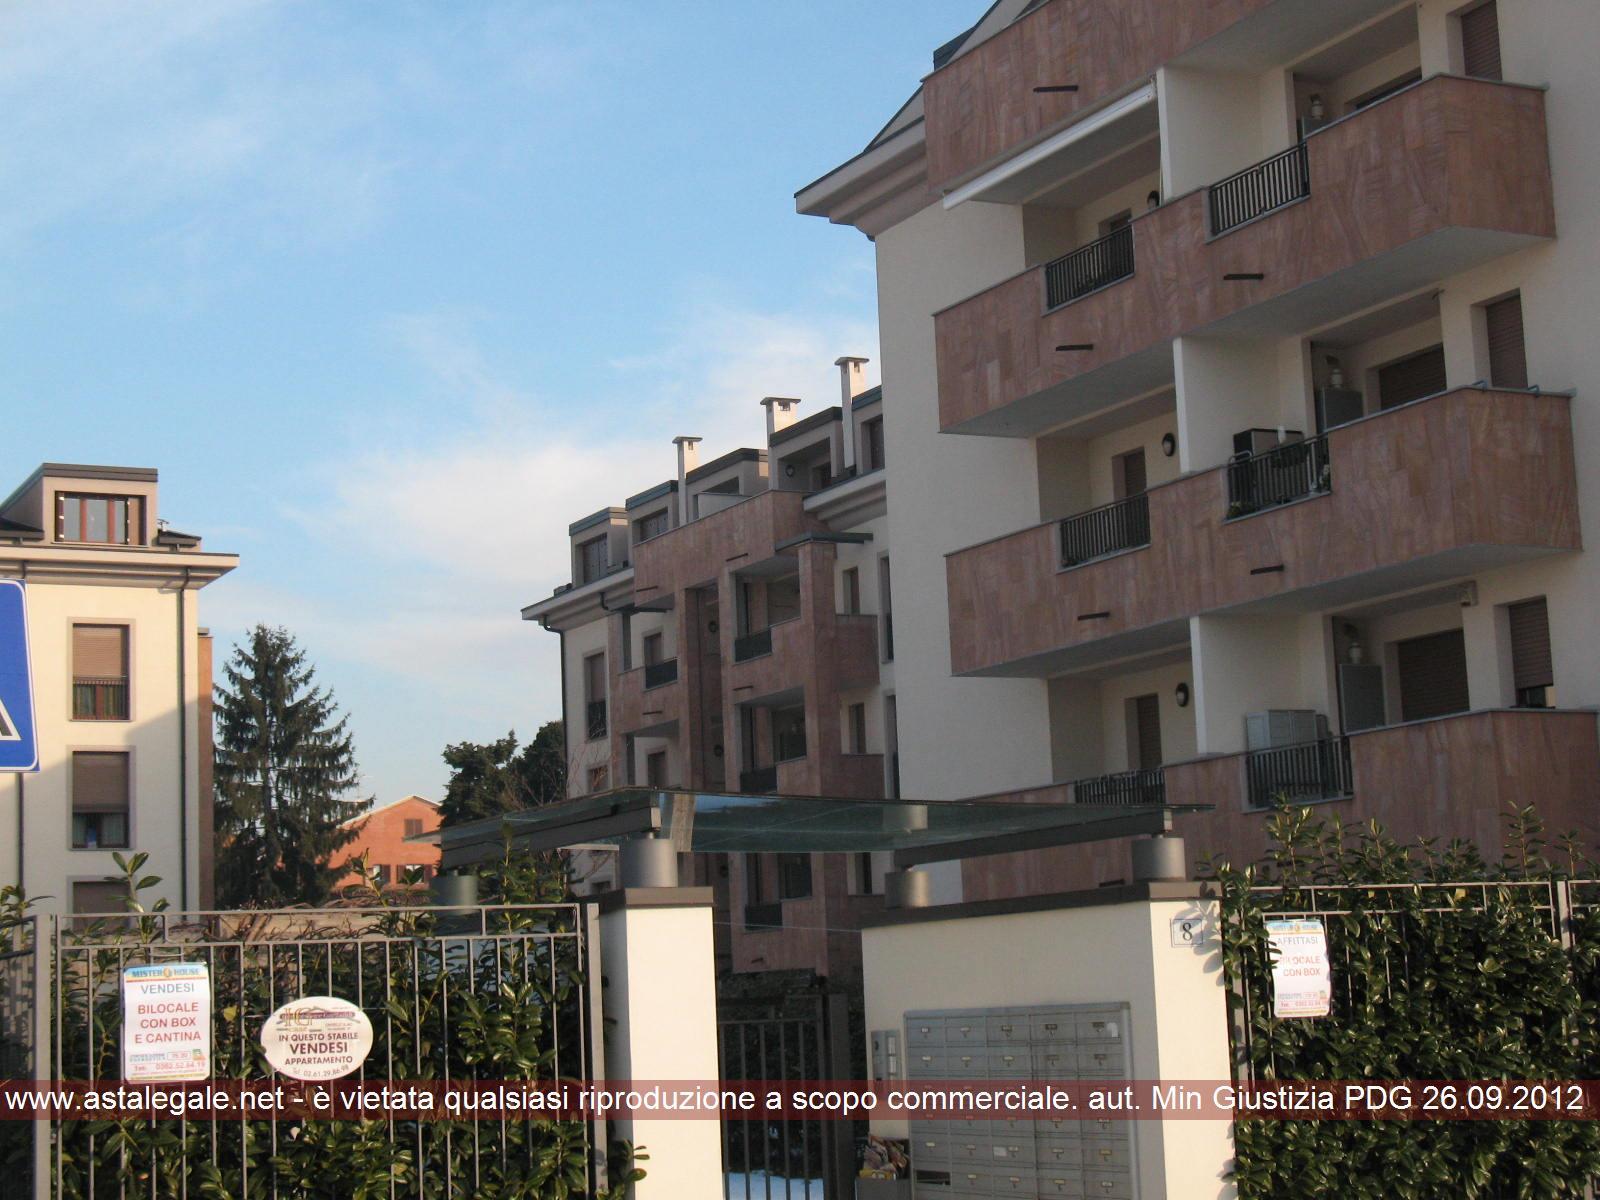 Cesano Maderno (MB) Frazione Cassina Savina Via S. Pertini n. 8/Via San Bernardo